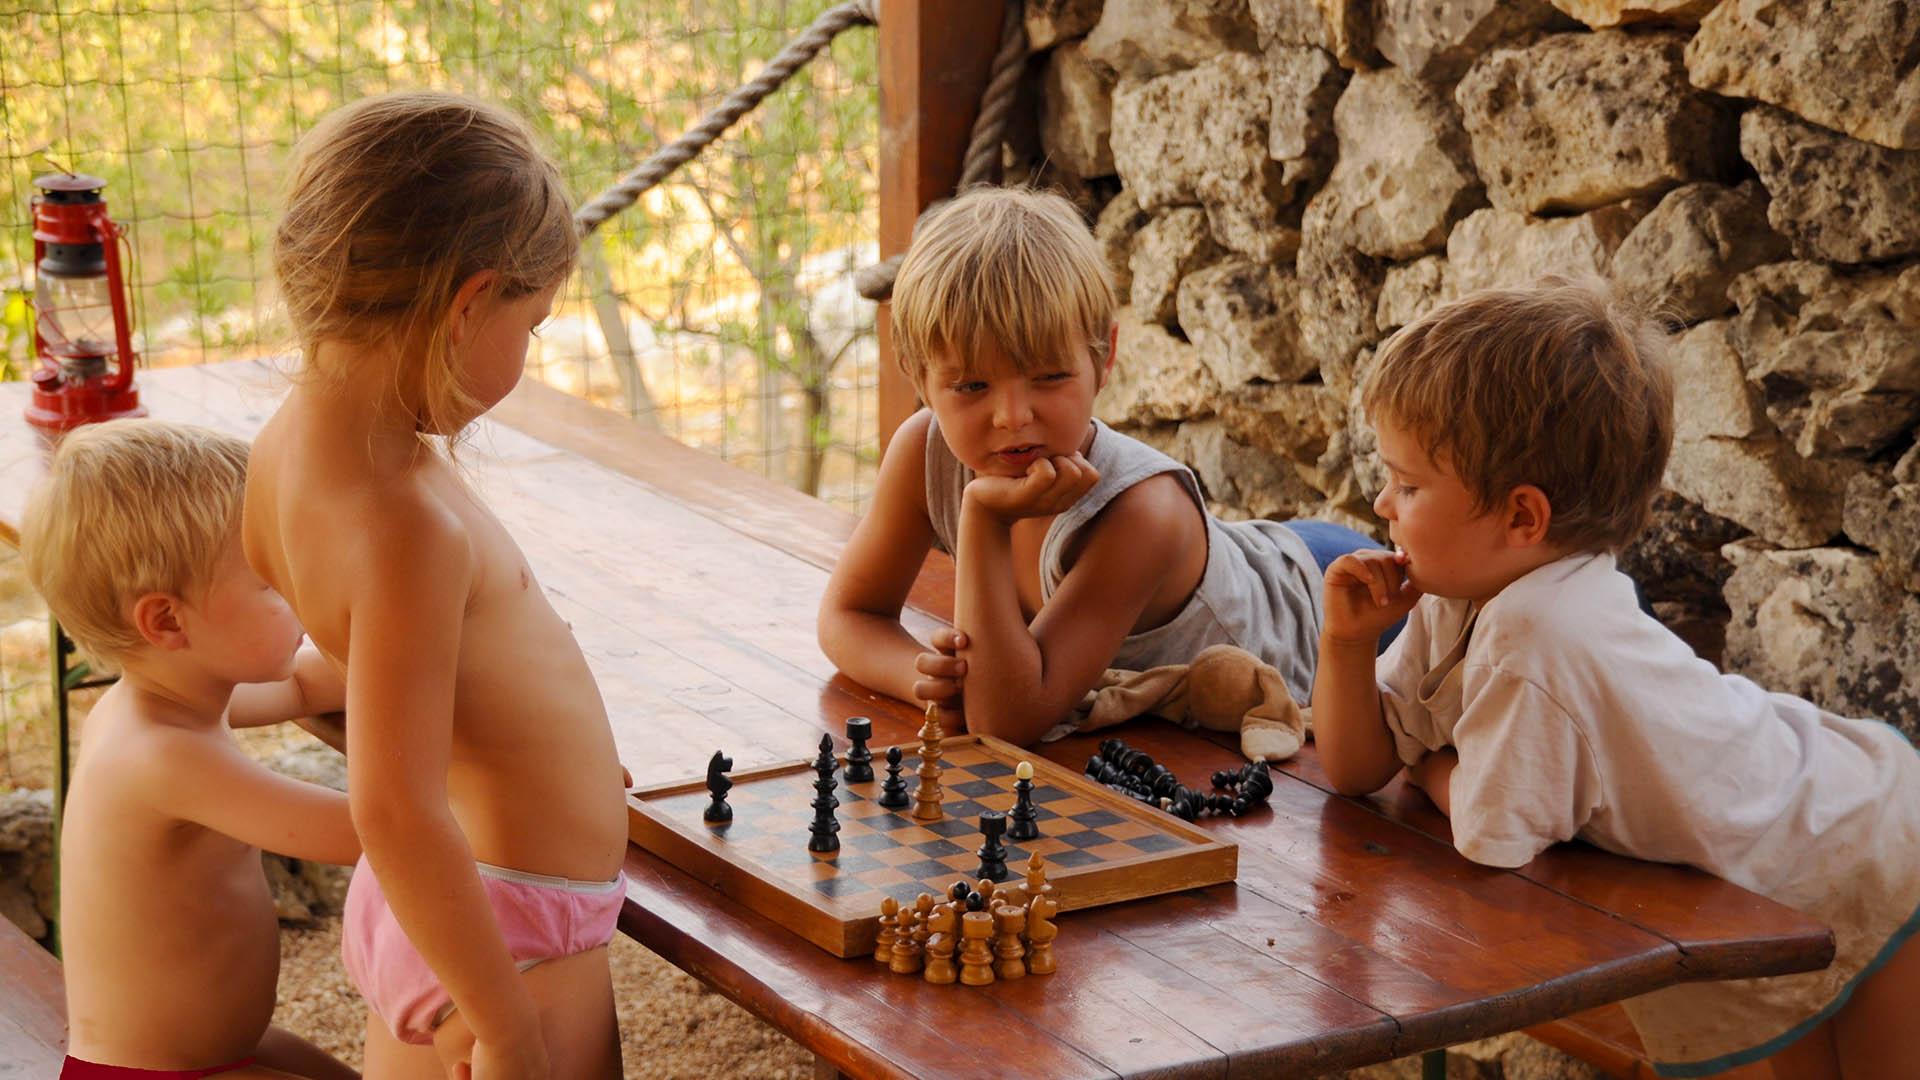 Campingplaats Op Naturist Fkk Naakt Camping Has Washer And Sauna